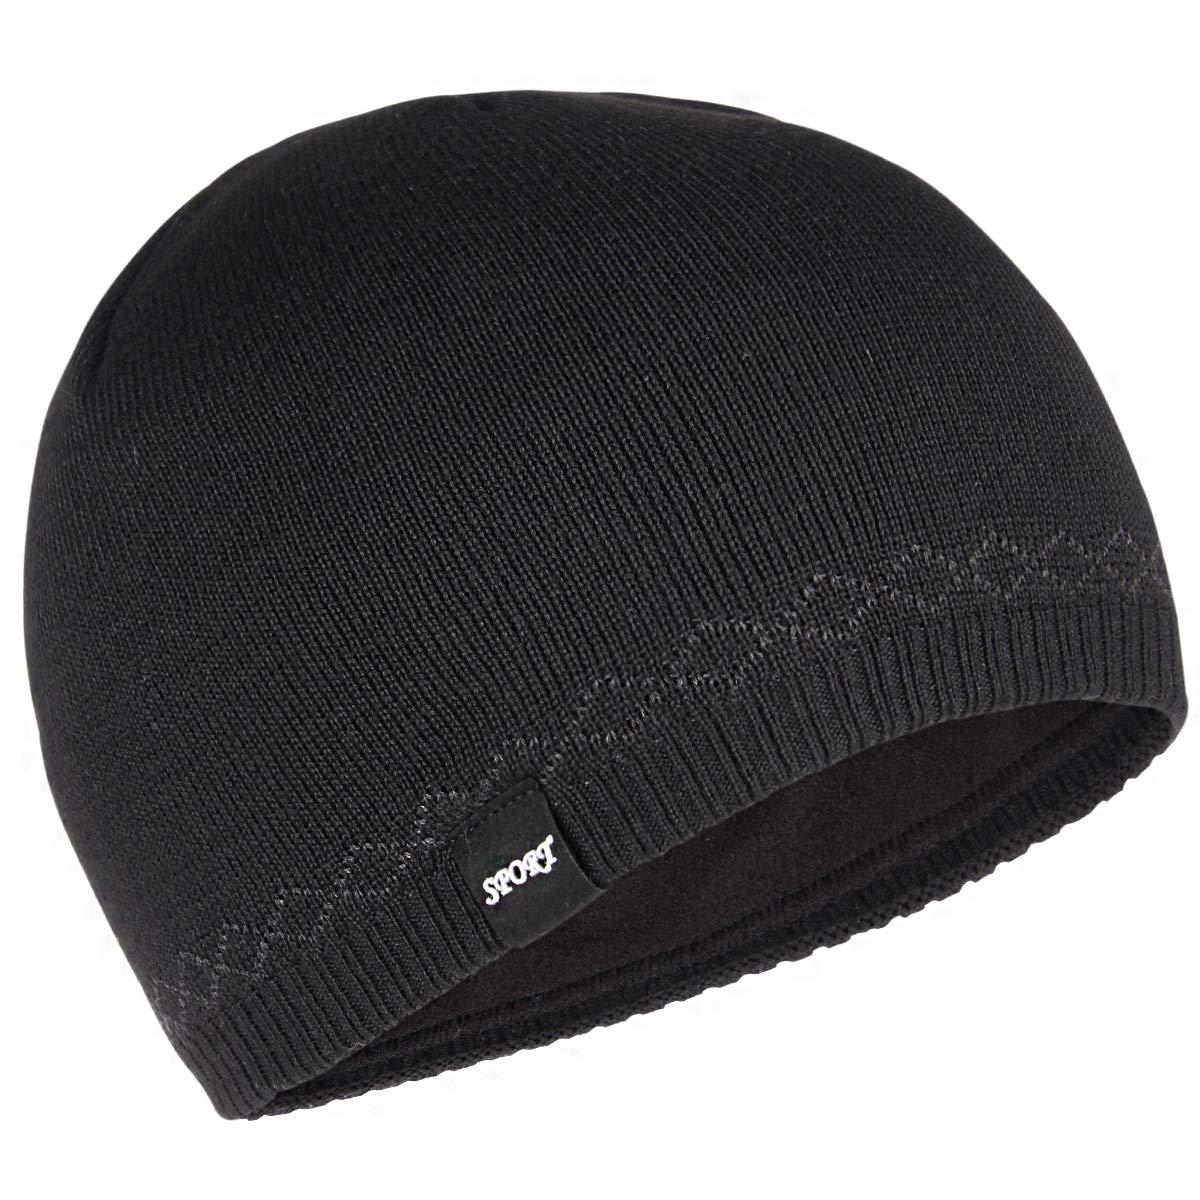 OMECHY Winter Warm Soft Lined Stretchy Beanie Hat Cuffed Plain Skull Cap Toboggan Thick Knit Hat Black